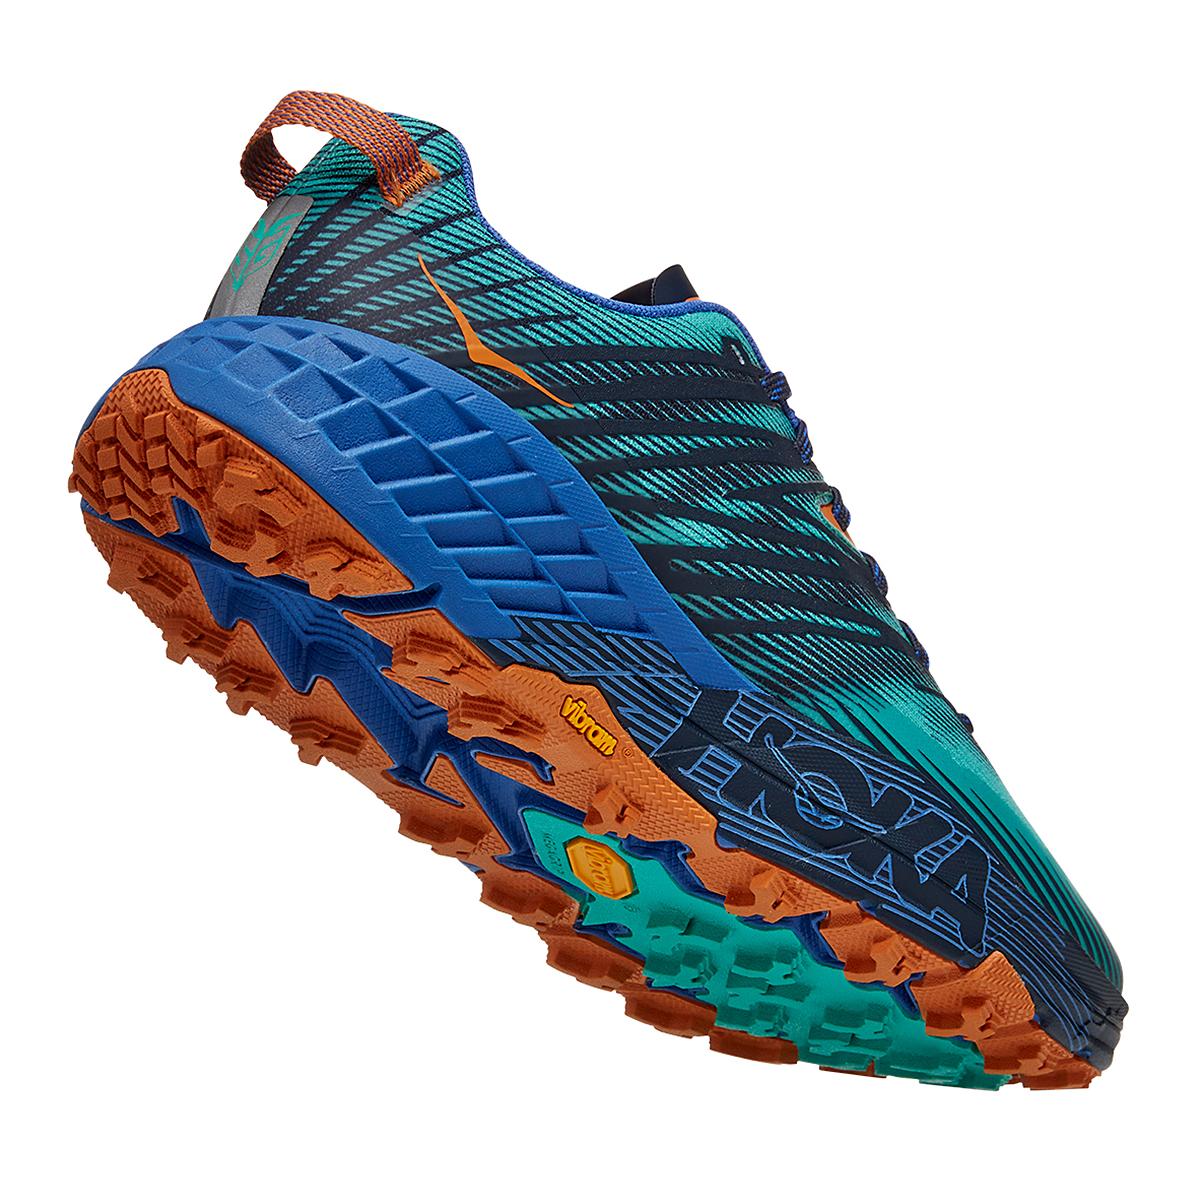 Men's Hoka One One Speedgoat 4 Trail Running Shoe - Color: Atlantis/Dazzling Blue - Size: 7 - Width: Regular, Atlantis/Dazzling Blue, large, image 4